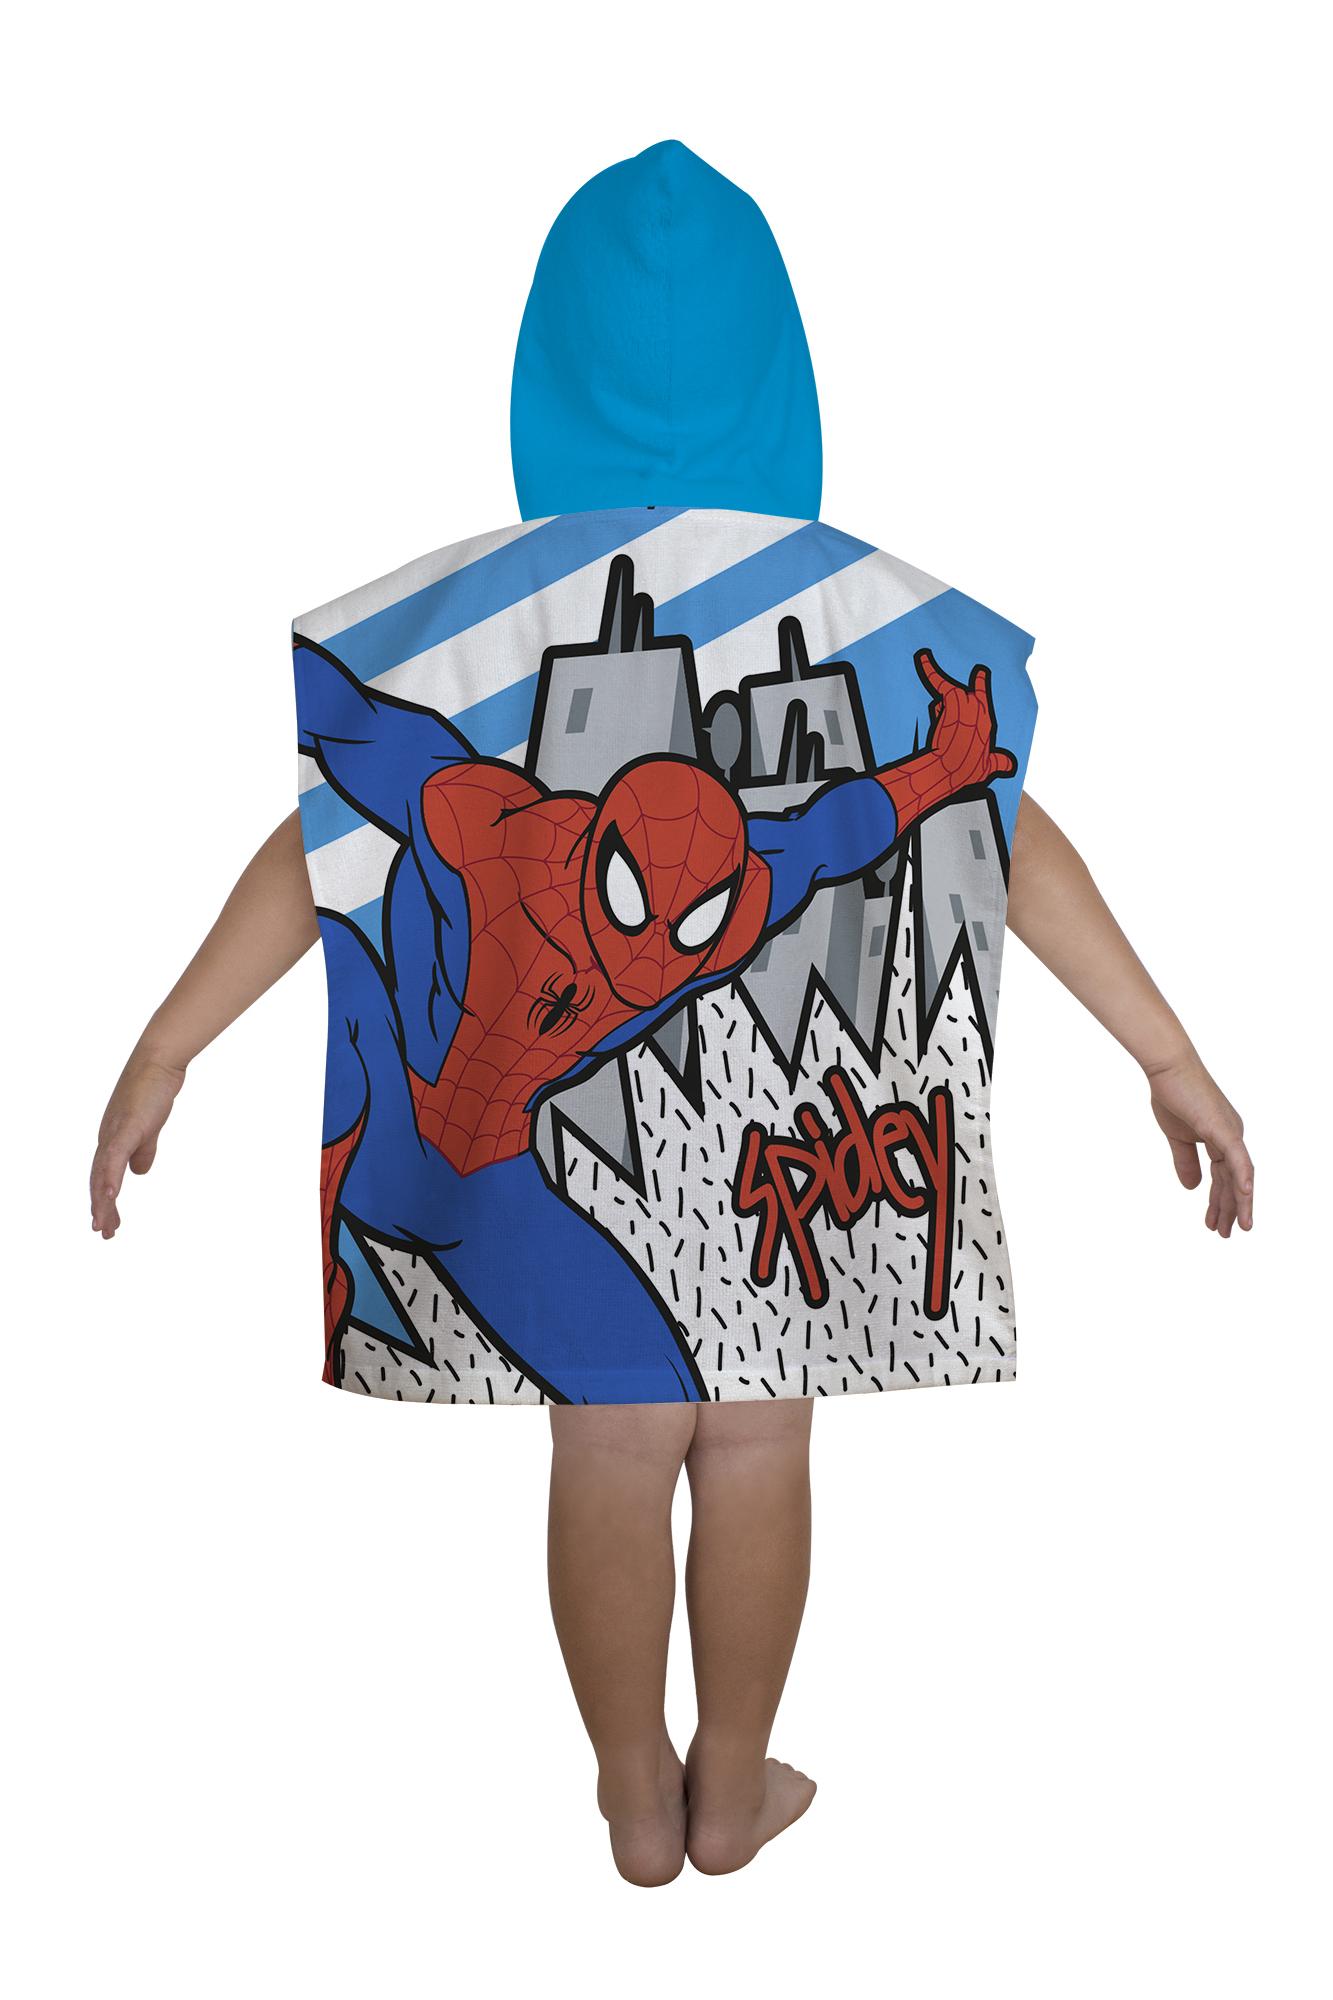 neu spiderman 39 abstrakt 39 kapuzen poncho handtuch strandbad. Black Bedroom Furniture Sets. Home Design Ideas